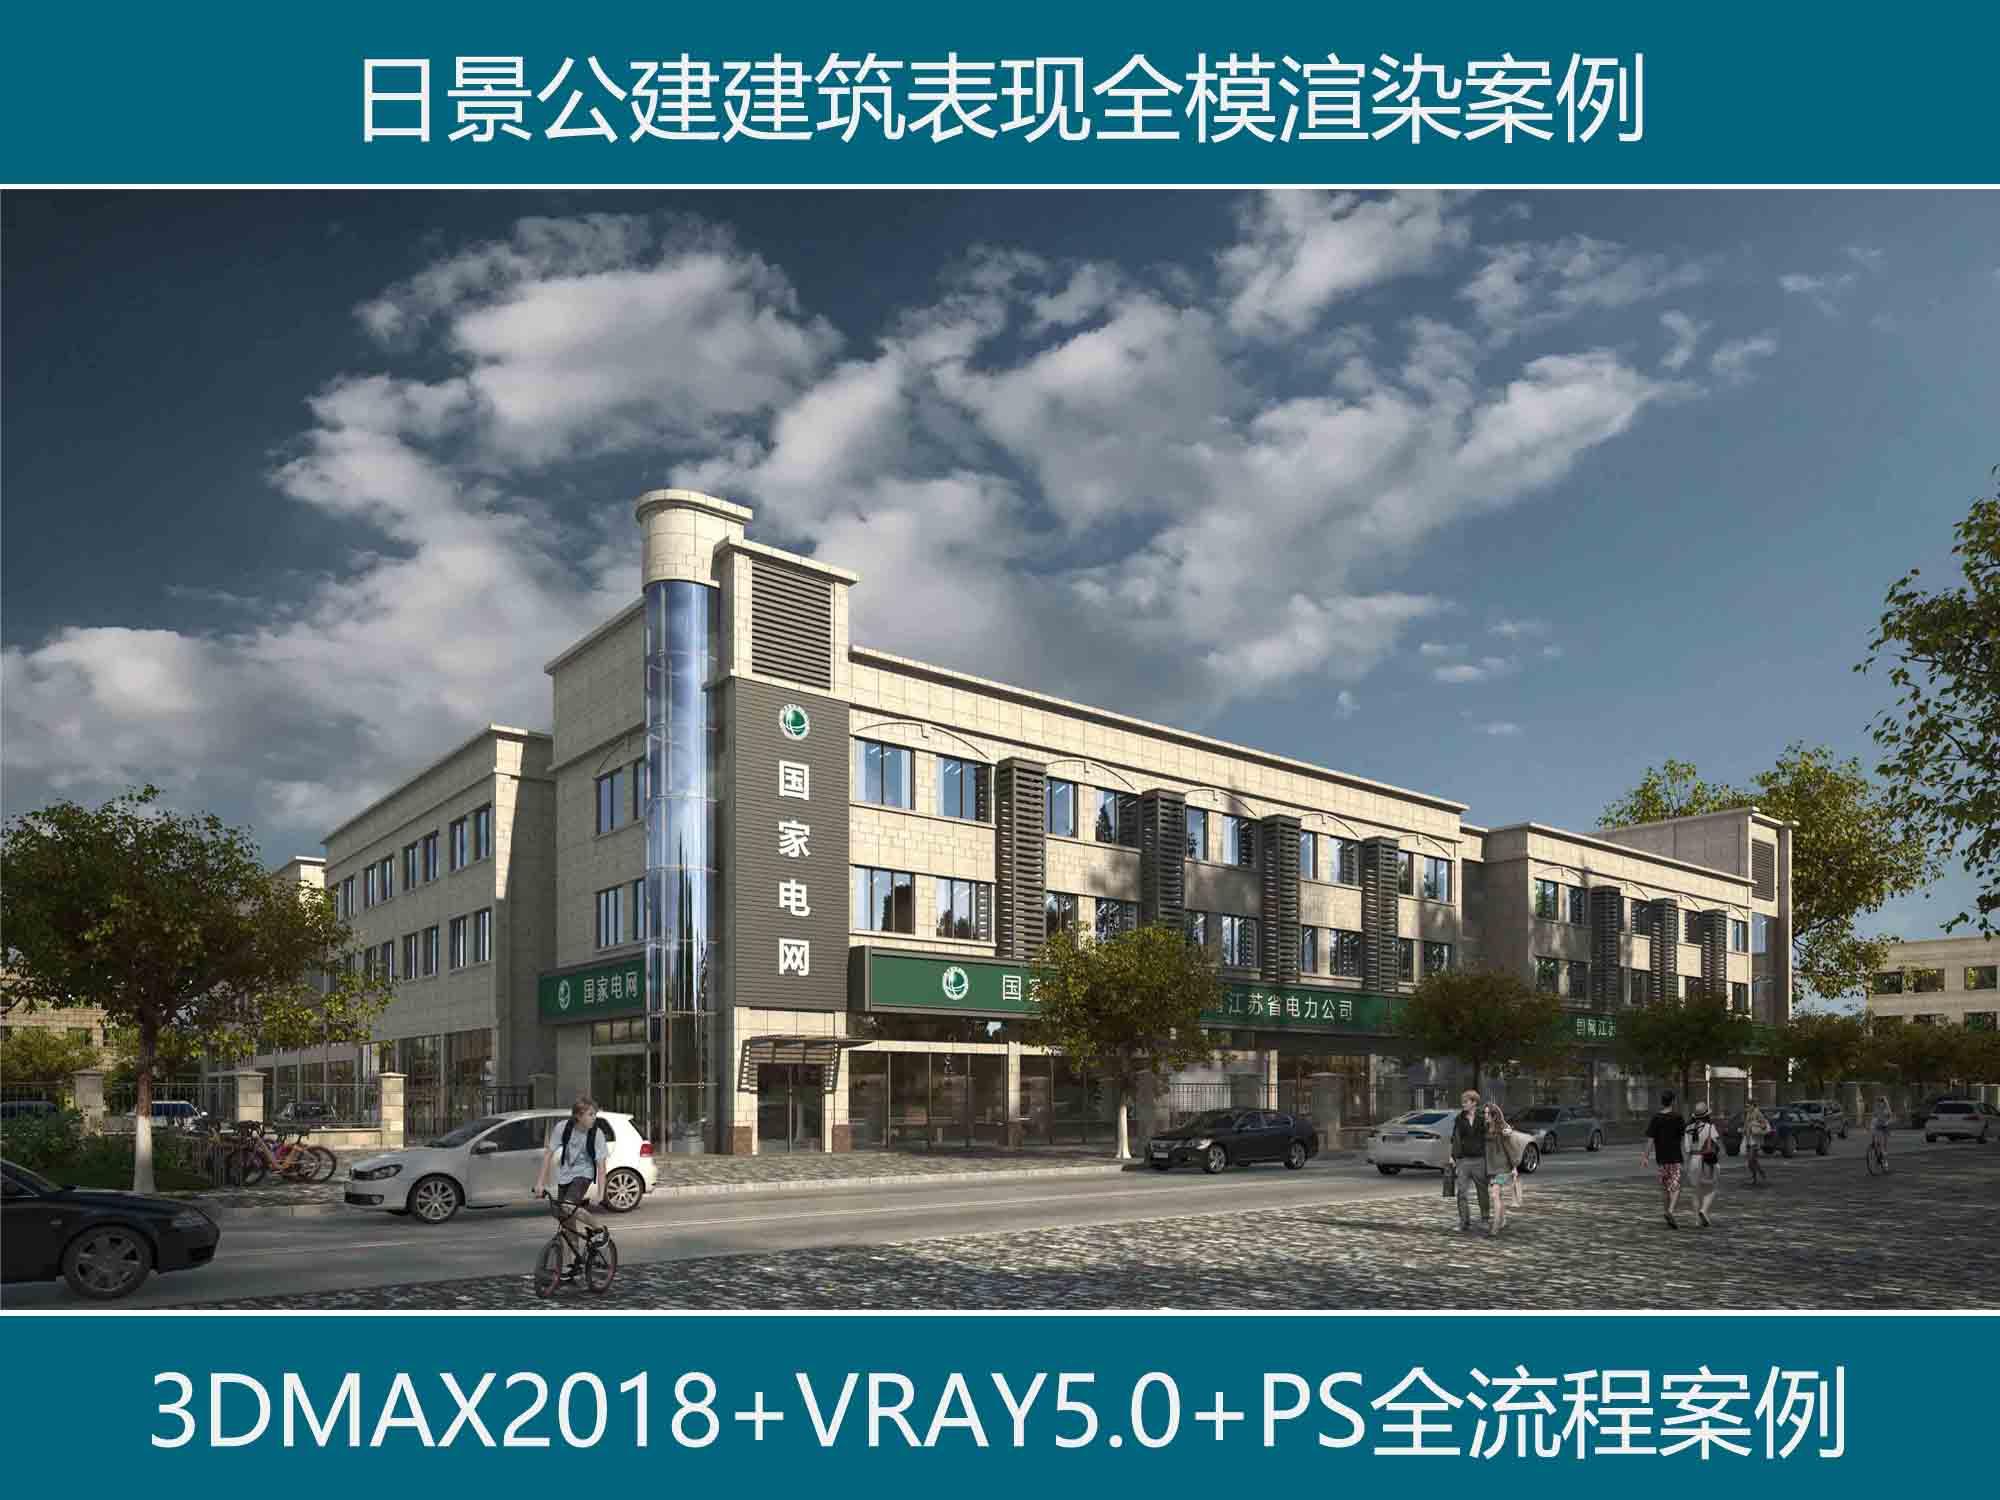 3DMAX+VRAY5.0日景公建建筑表现